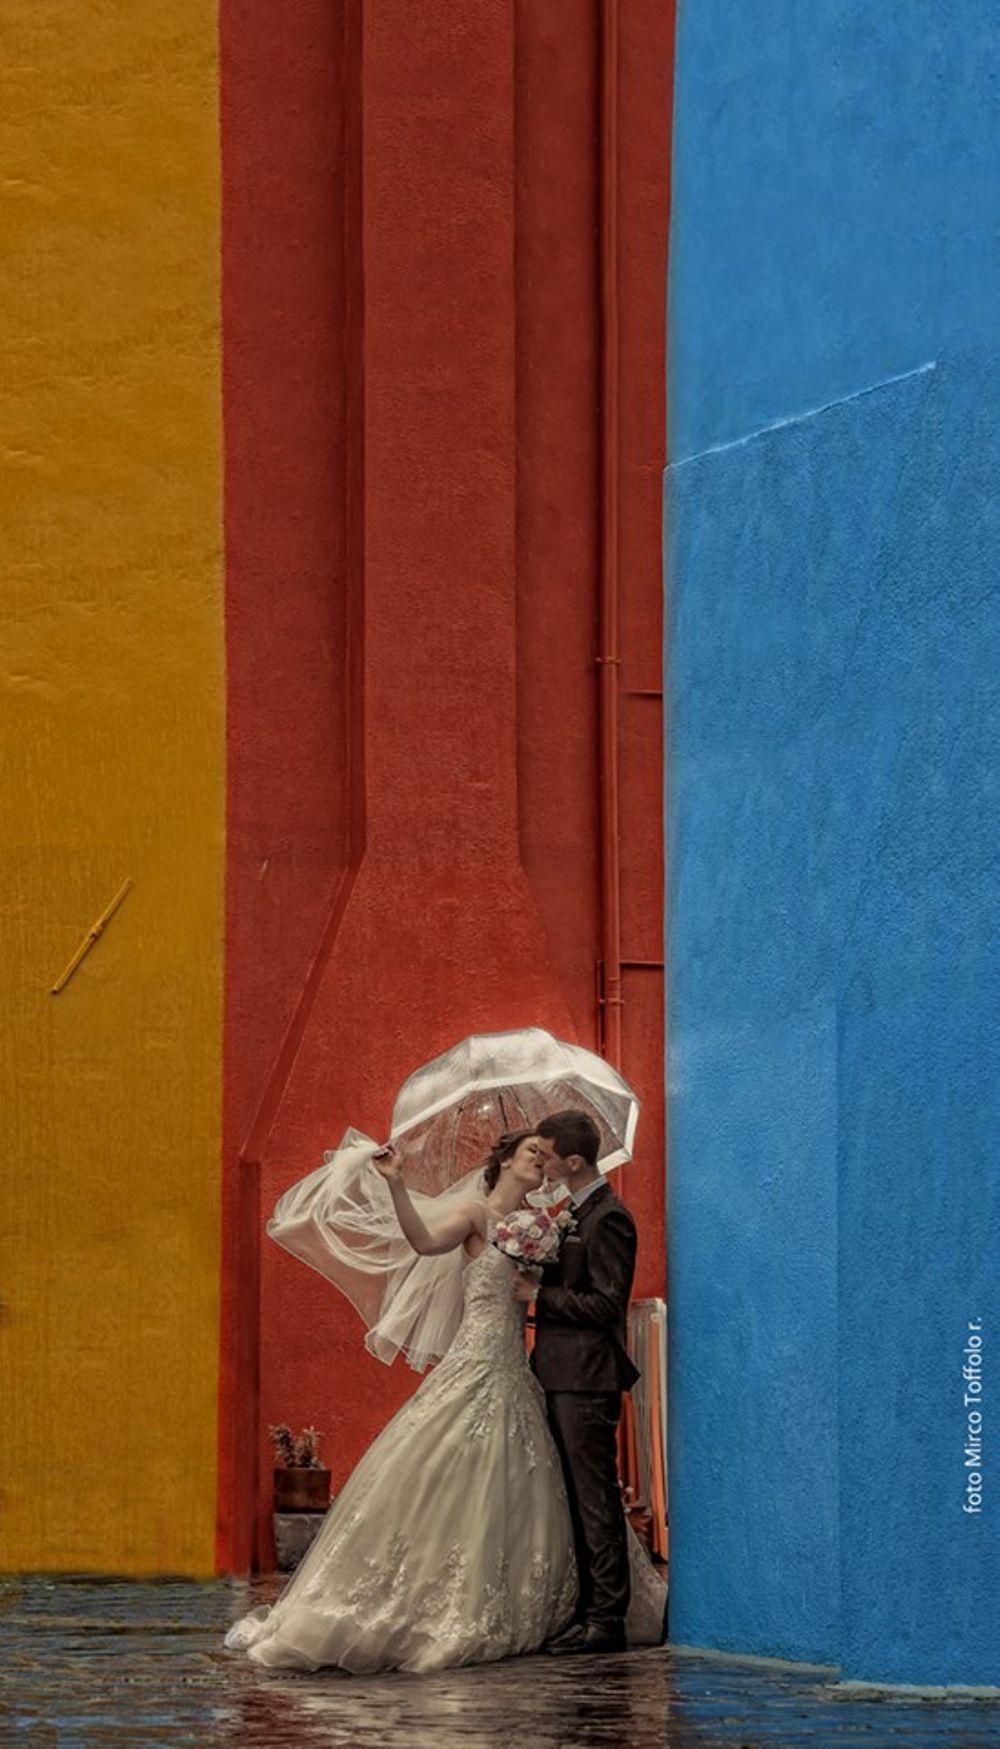 Mirco Toffolo photo